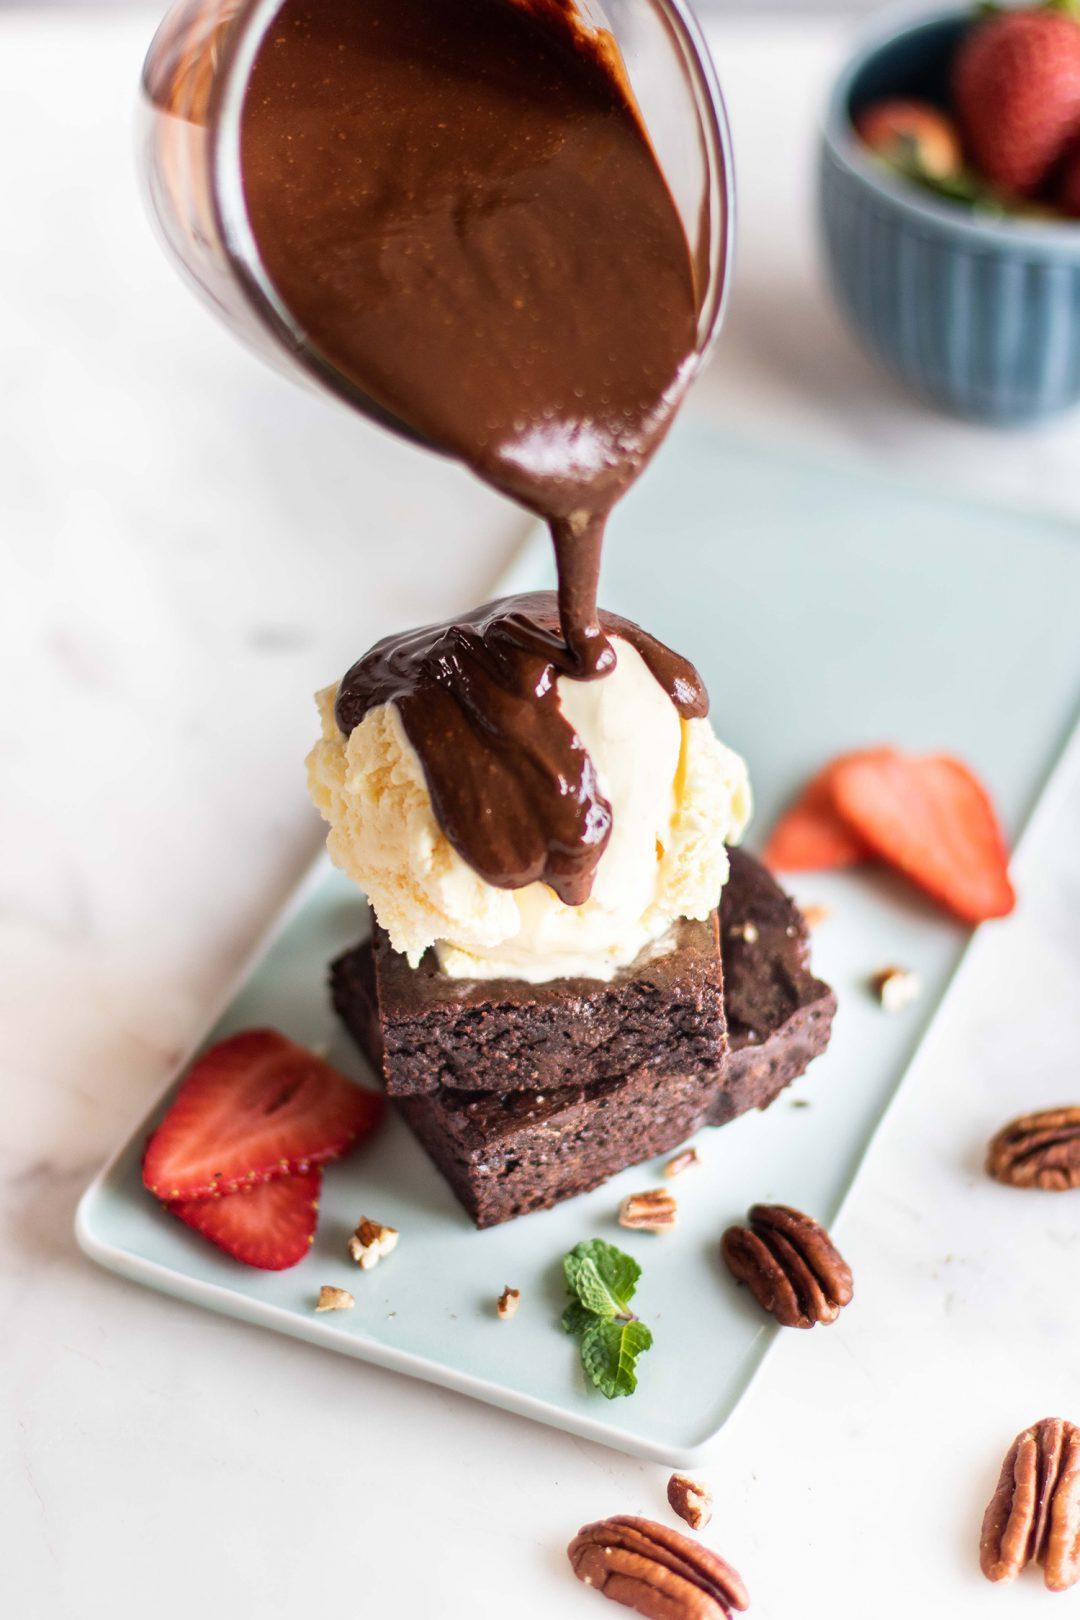 Chocolare drizzle on ice cream scoop and fudge.